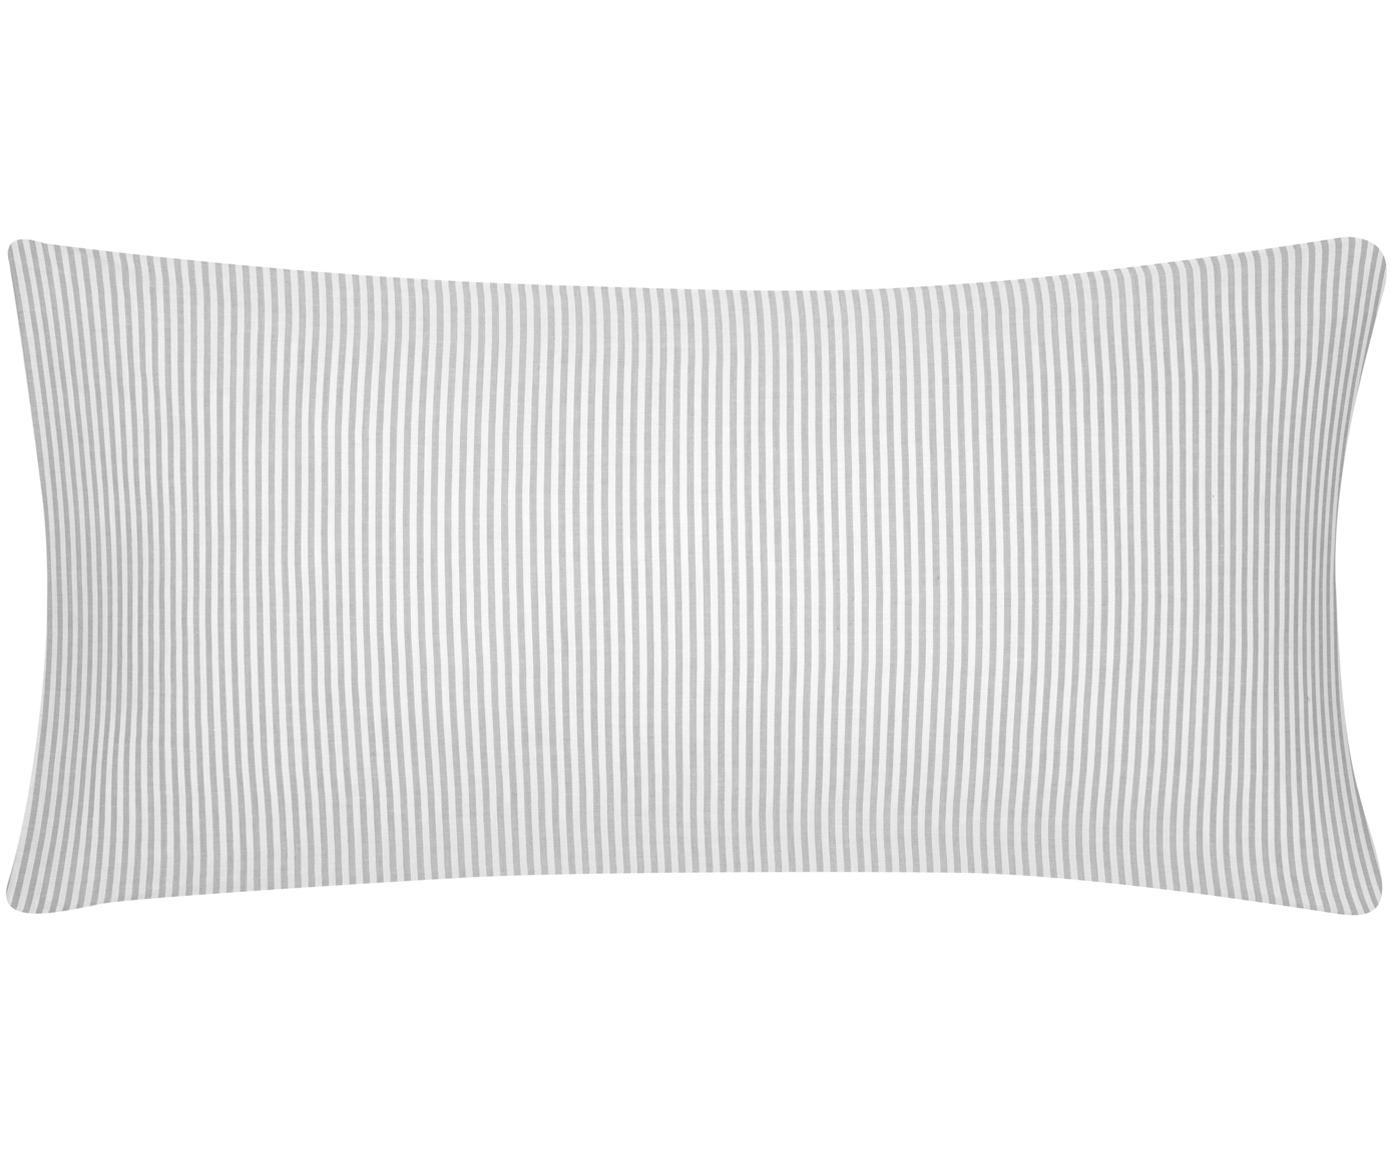 Baumwoll-Kissenbezüge Ellie, fein gestreift, 2 Stück, Webart: Renforcé Fadendichte 118 , Weiß, Grau, 40 x 80 cm